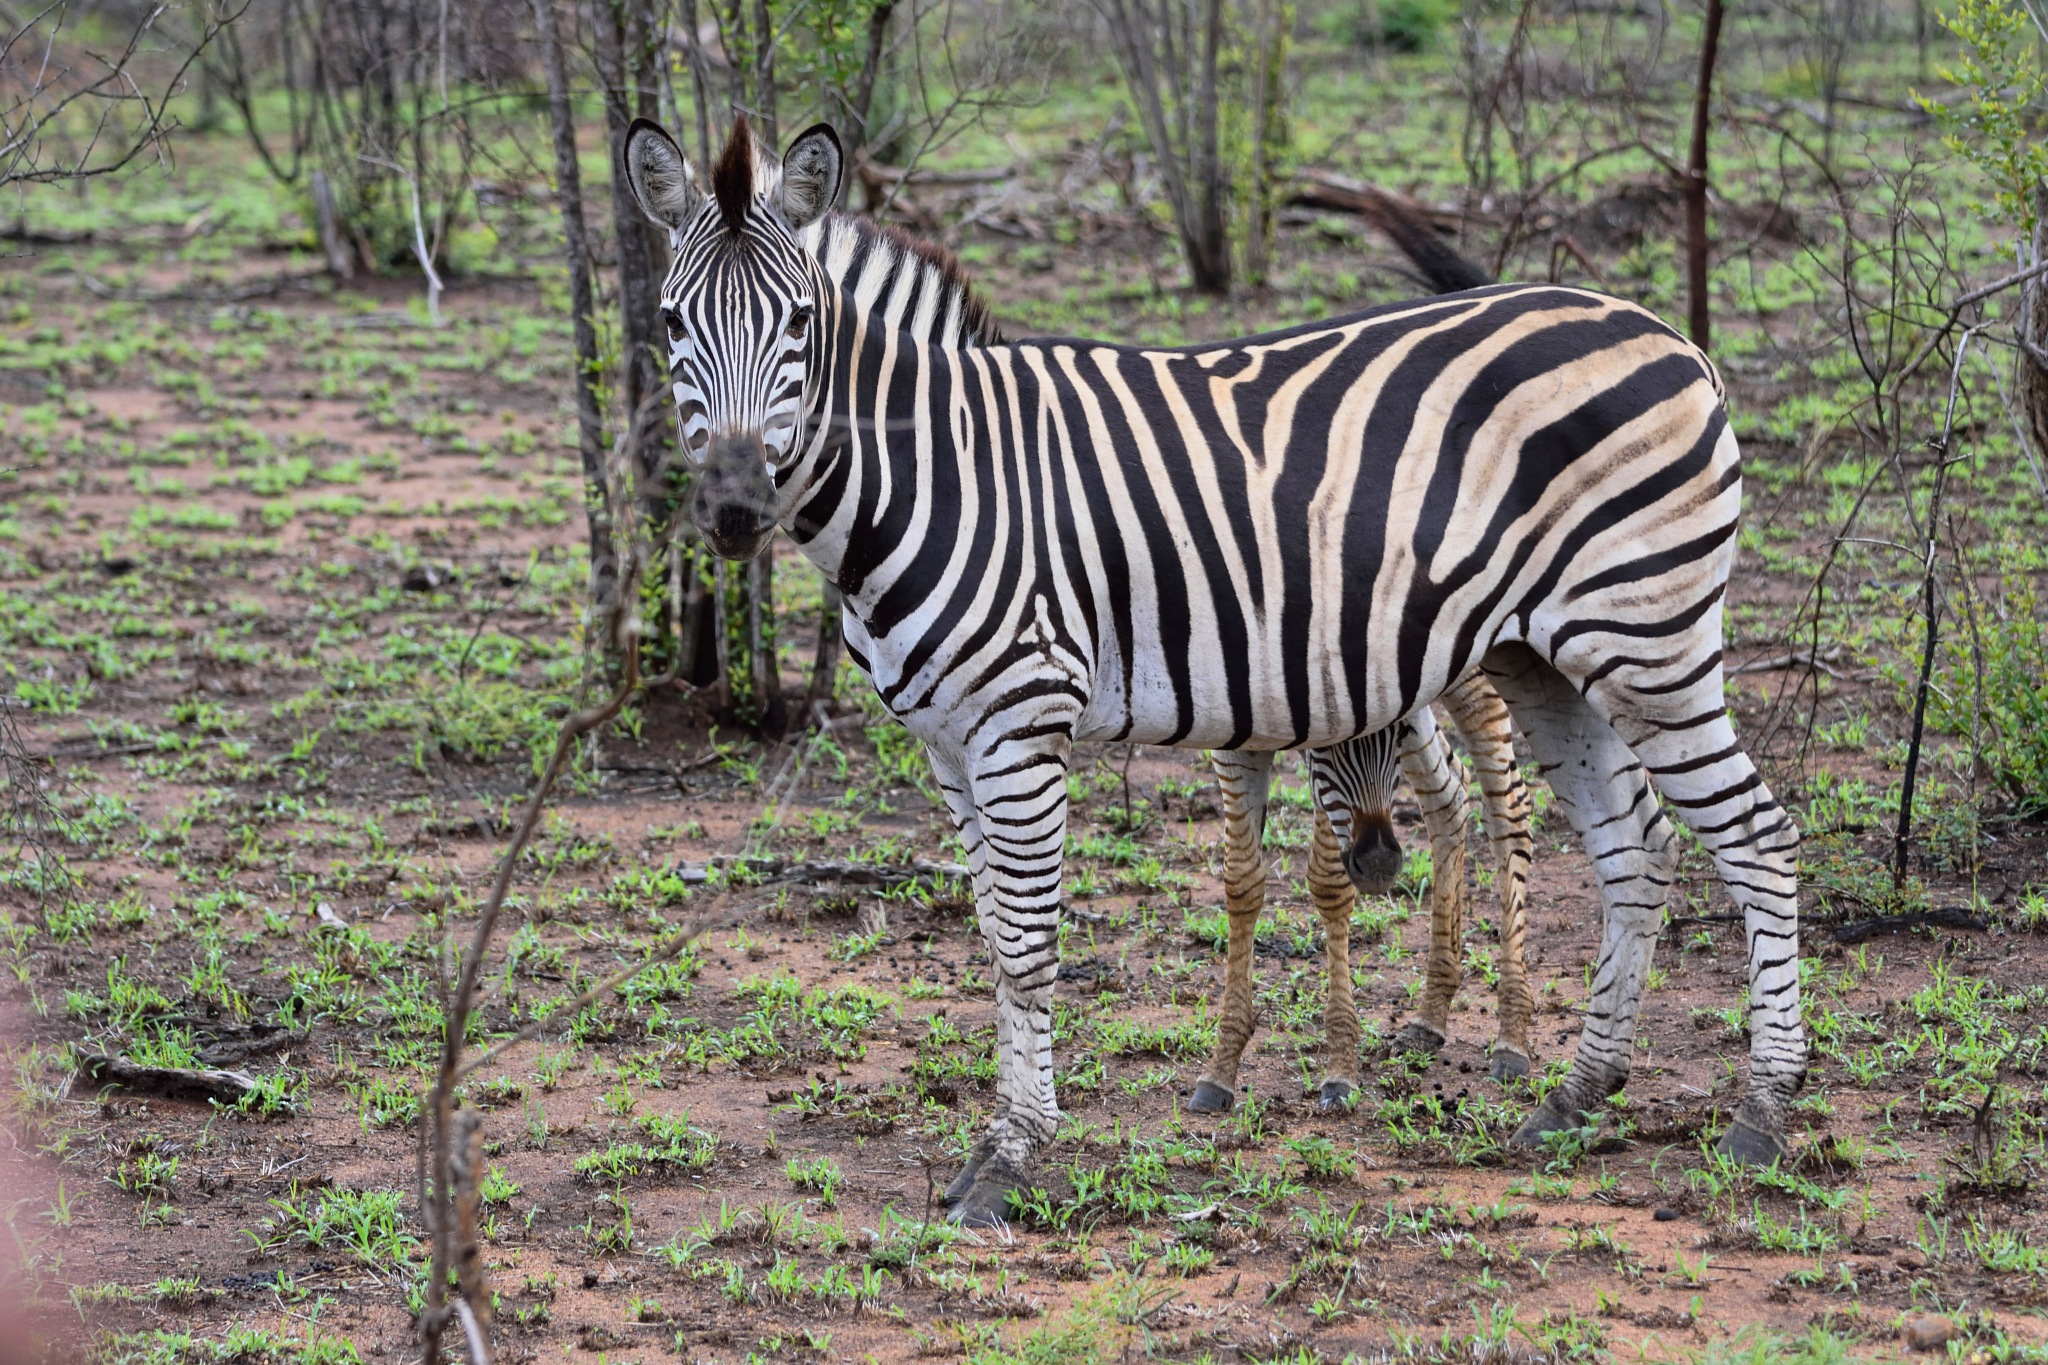 South Africa - Kruger Park (278) Burchell's Zebra by Derek Clarke